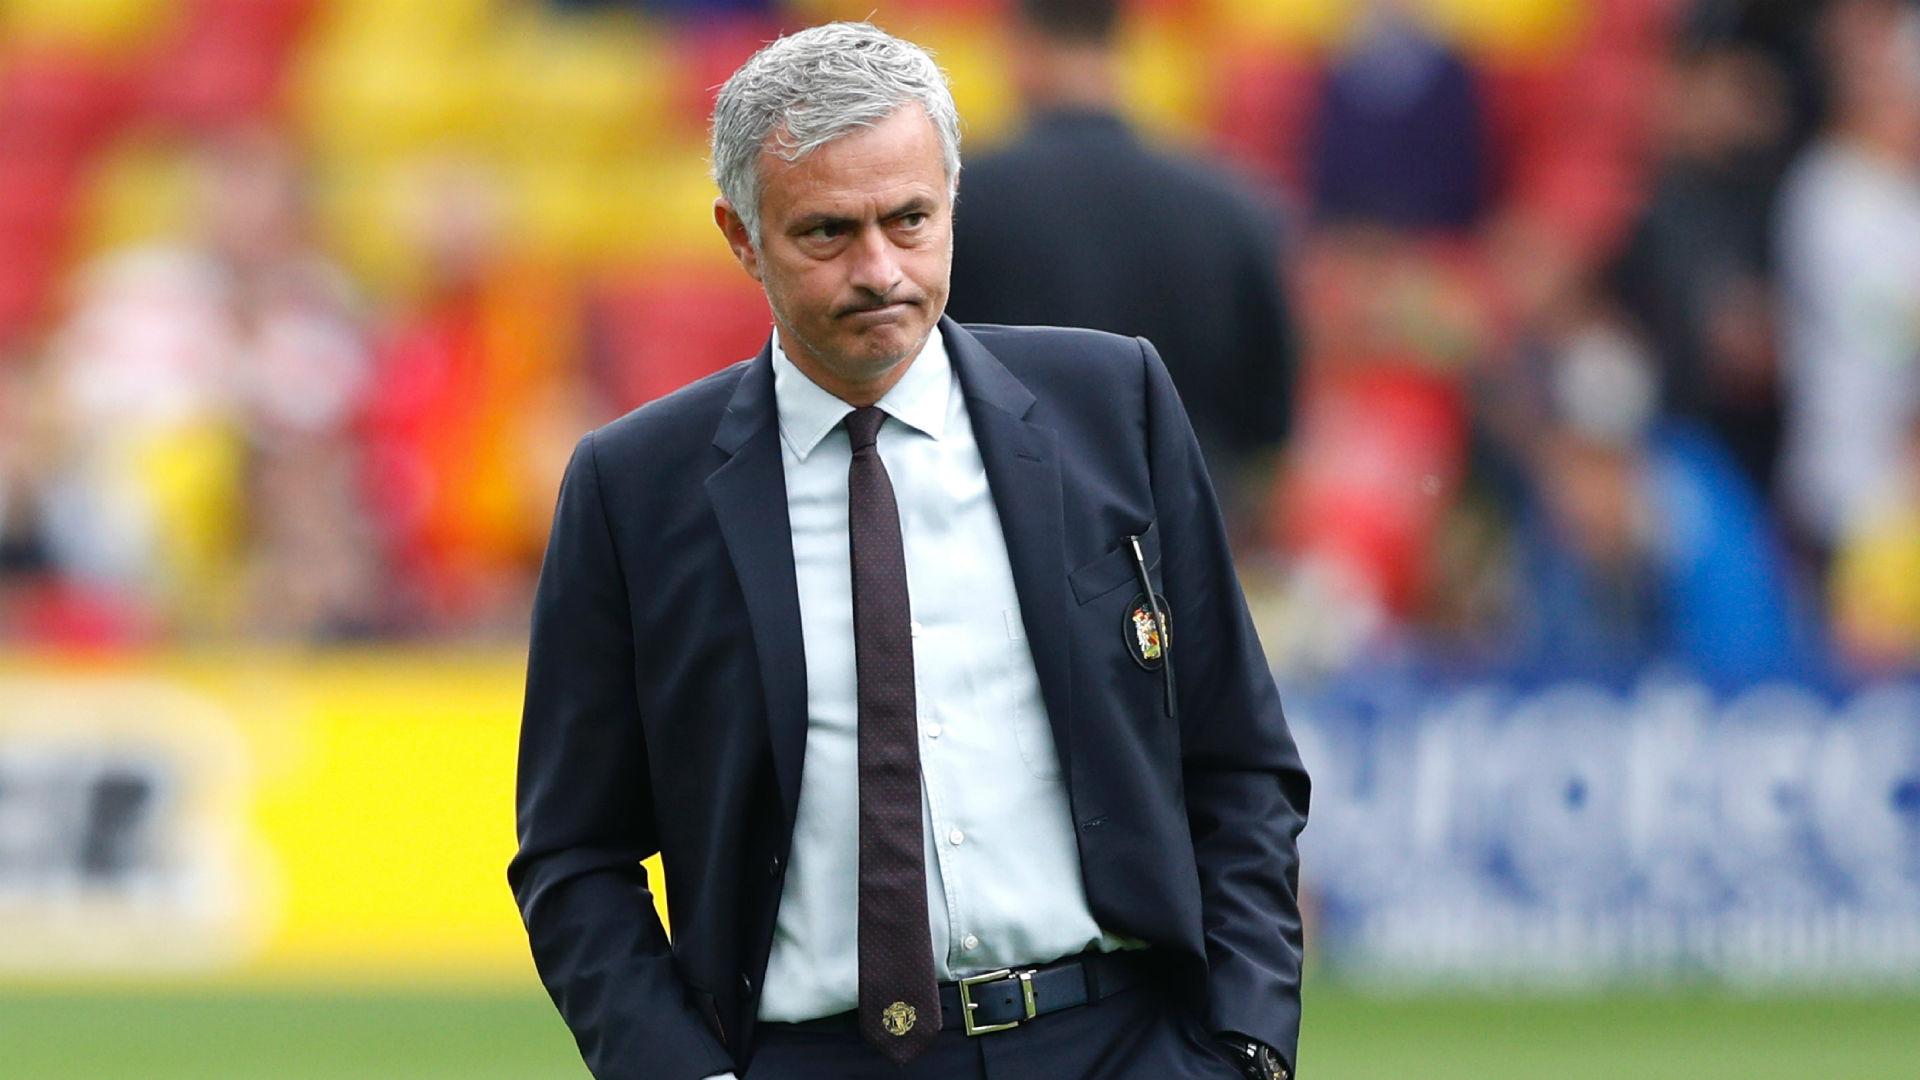 Northampton 1 Manchester United 3: Mourinho's men halt losing run